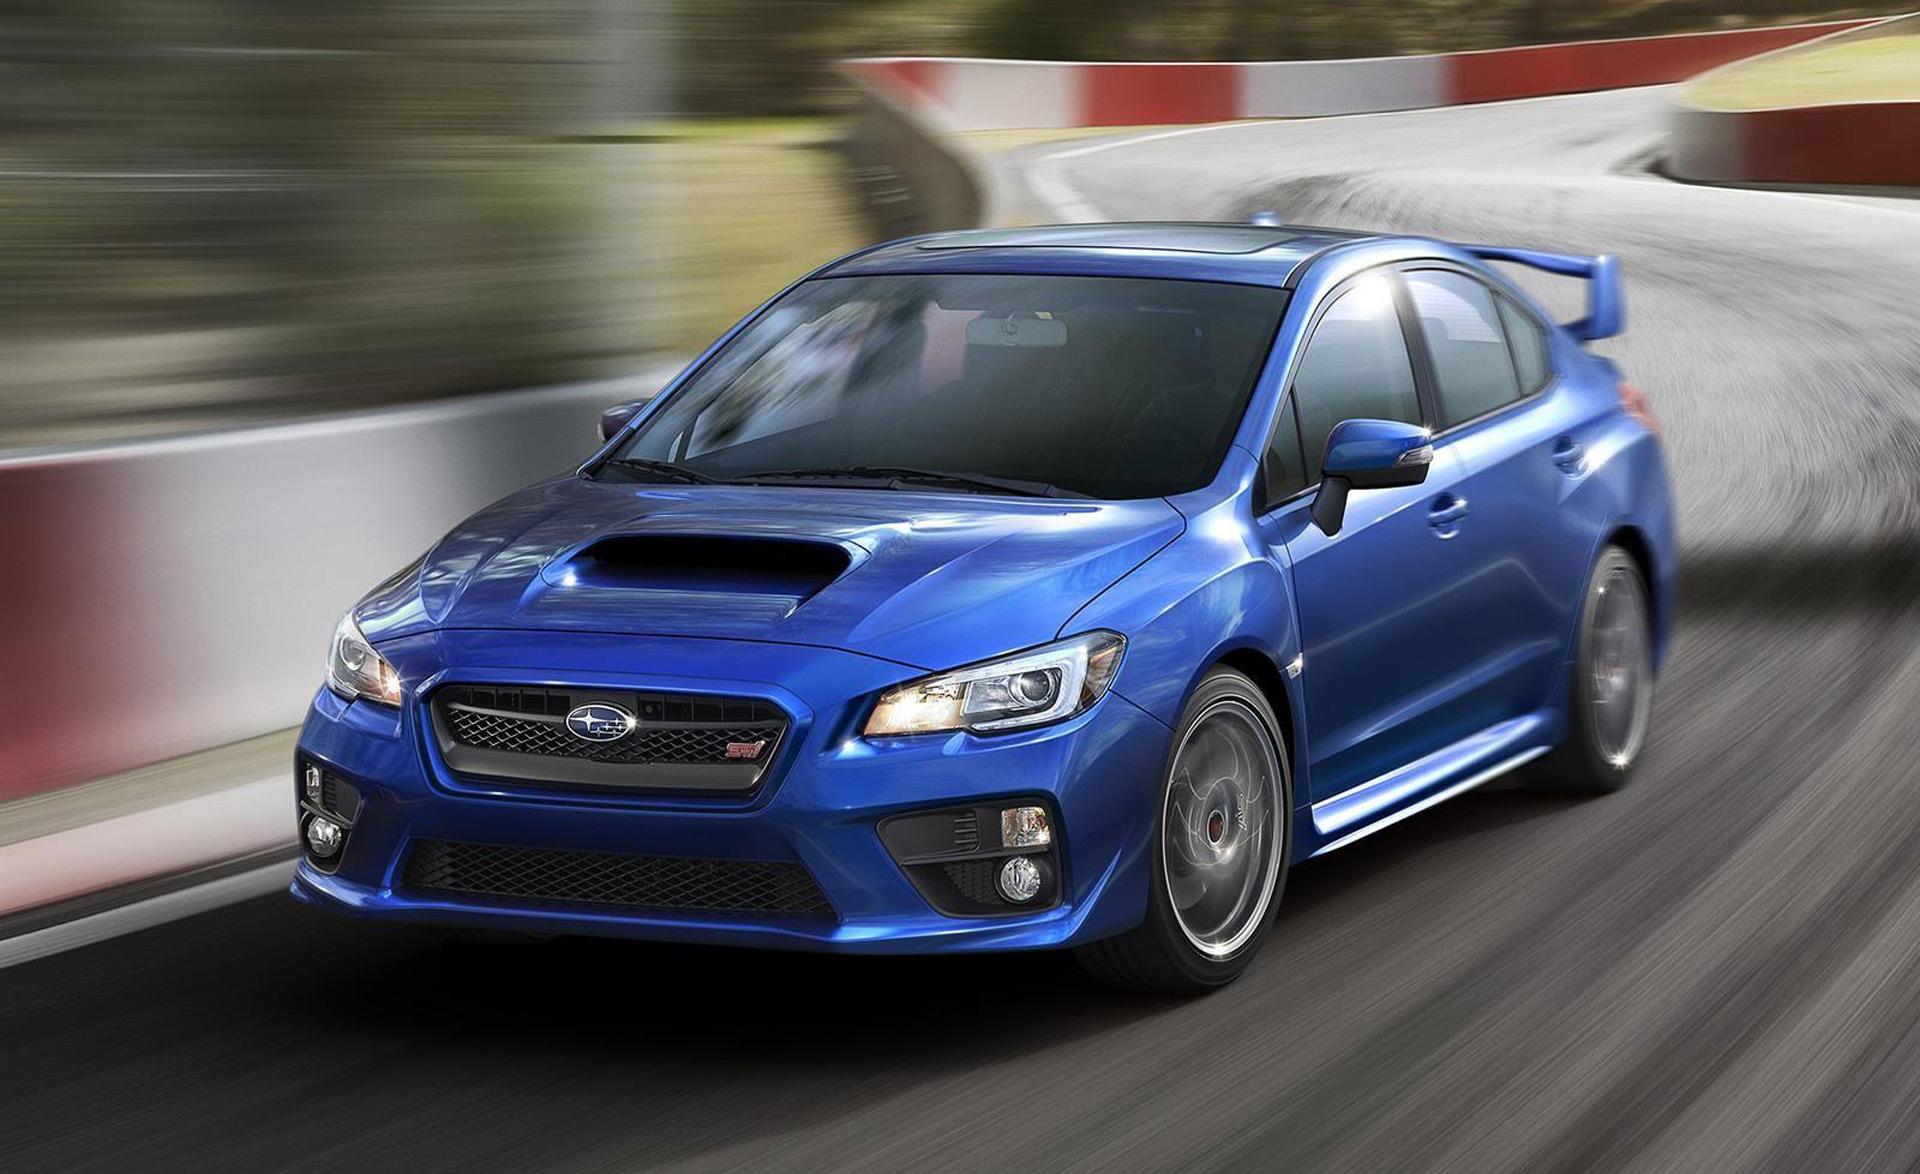 Subaru Wrx High Definition Wallpapers